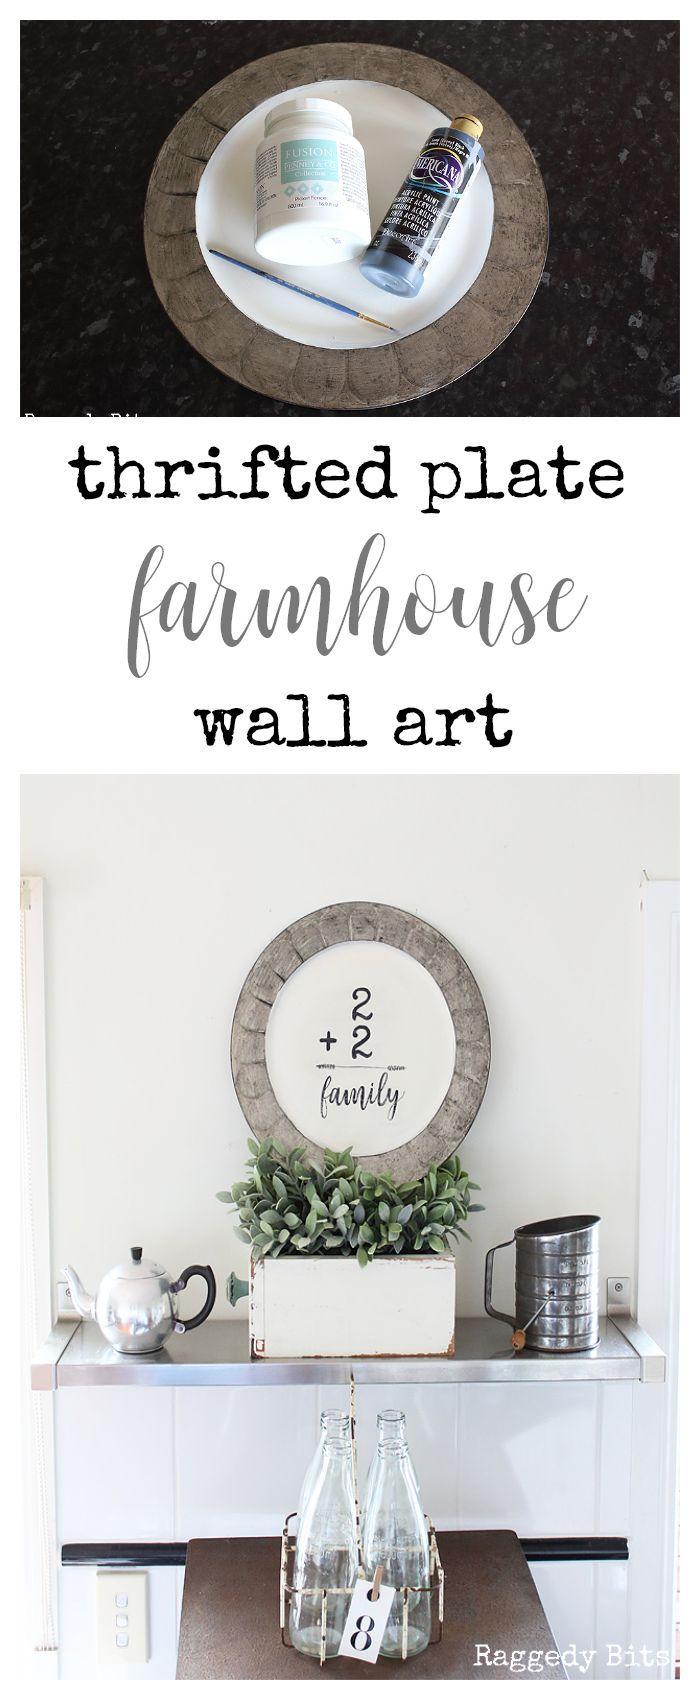 A fun easy Thrifted Plate Farmhouse Wall Art to make | www.raggedy-bits.com | #diy #farmhouse #repurpose #painted #wallart